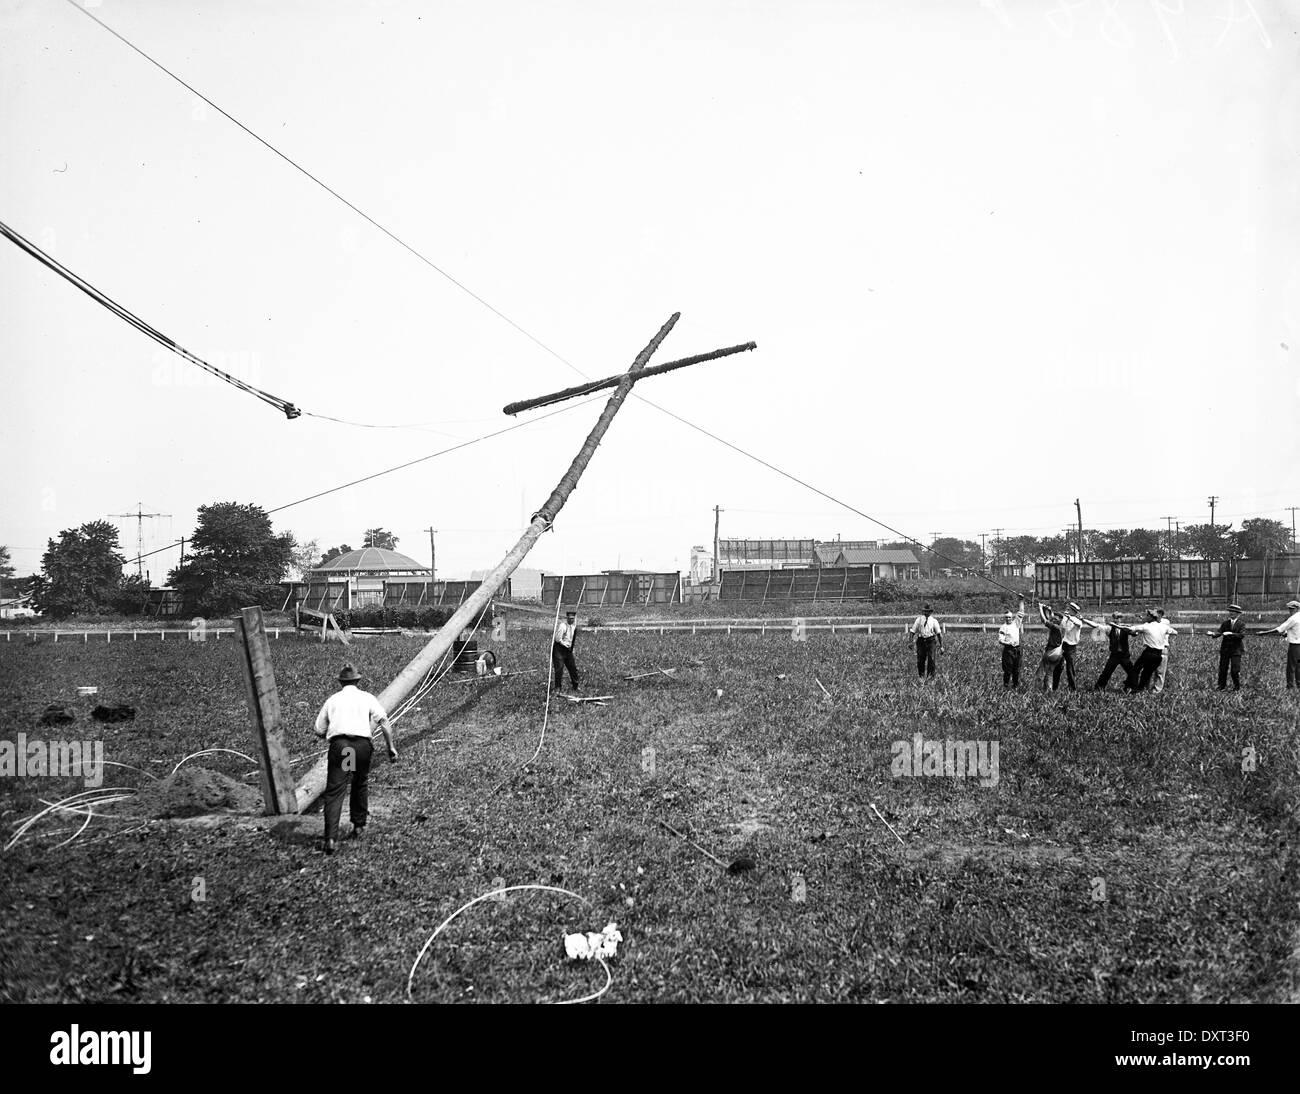 Ku Klux Klan Cross burning, United States of America - Stock Image